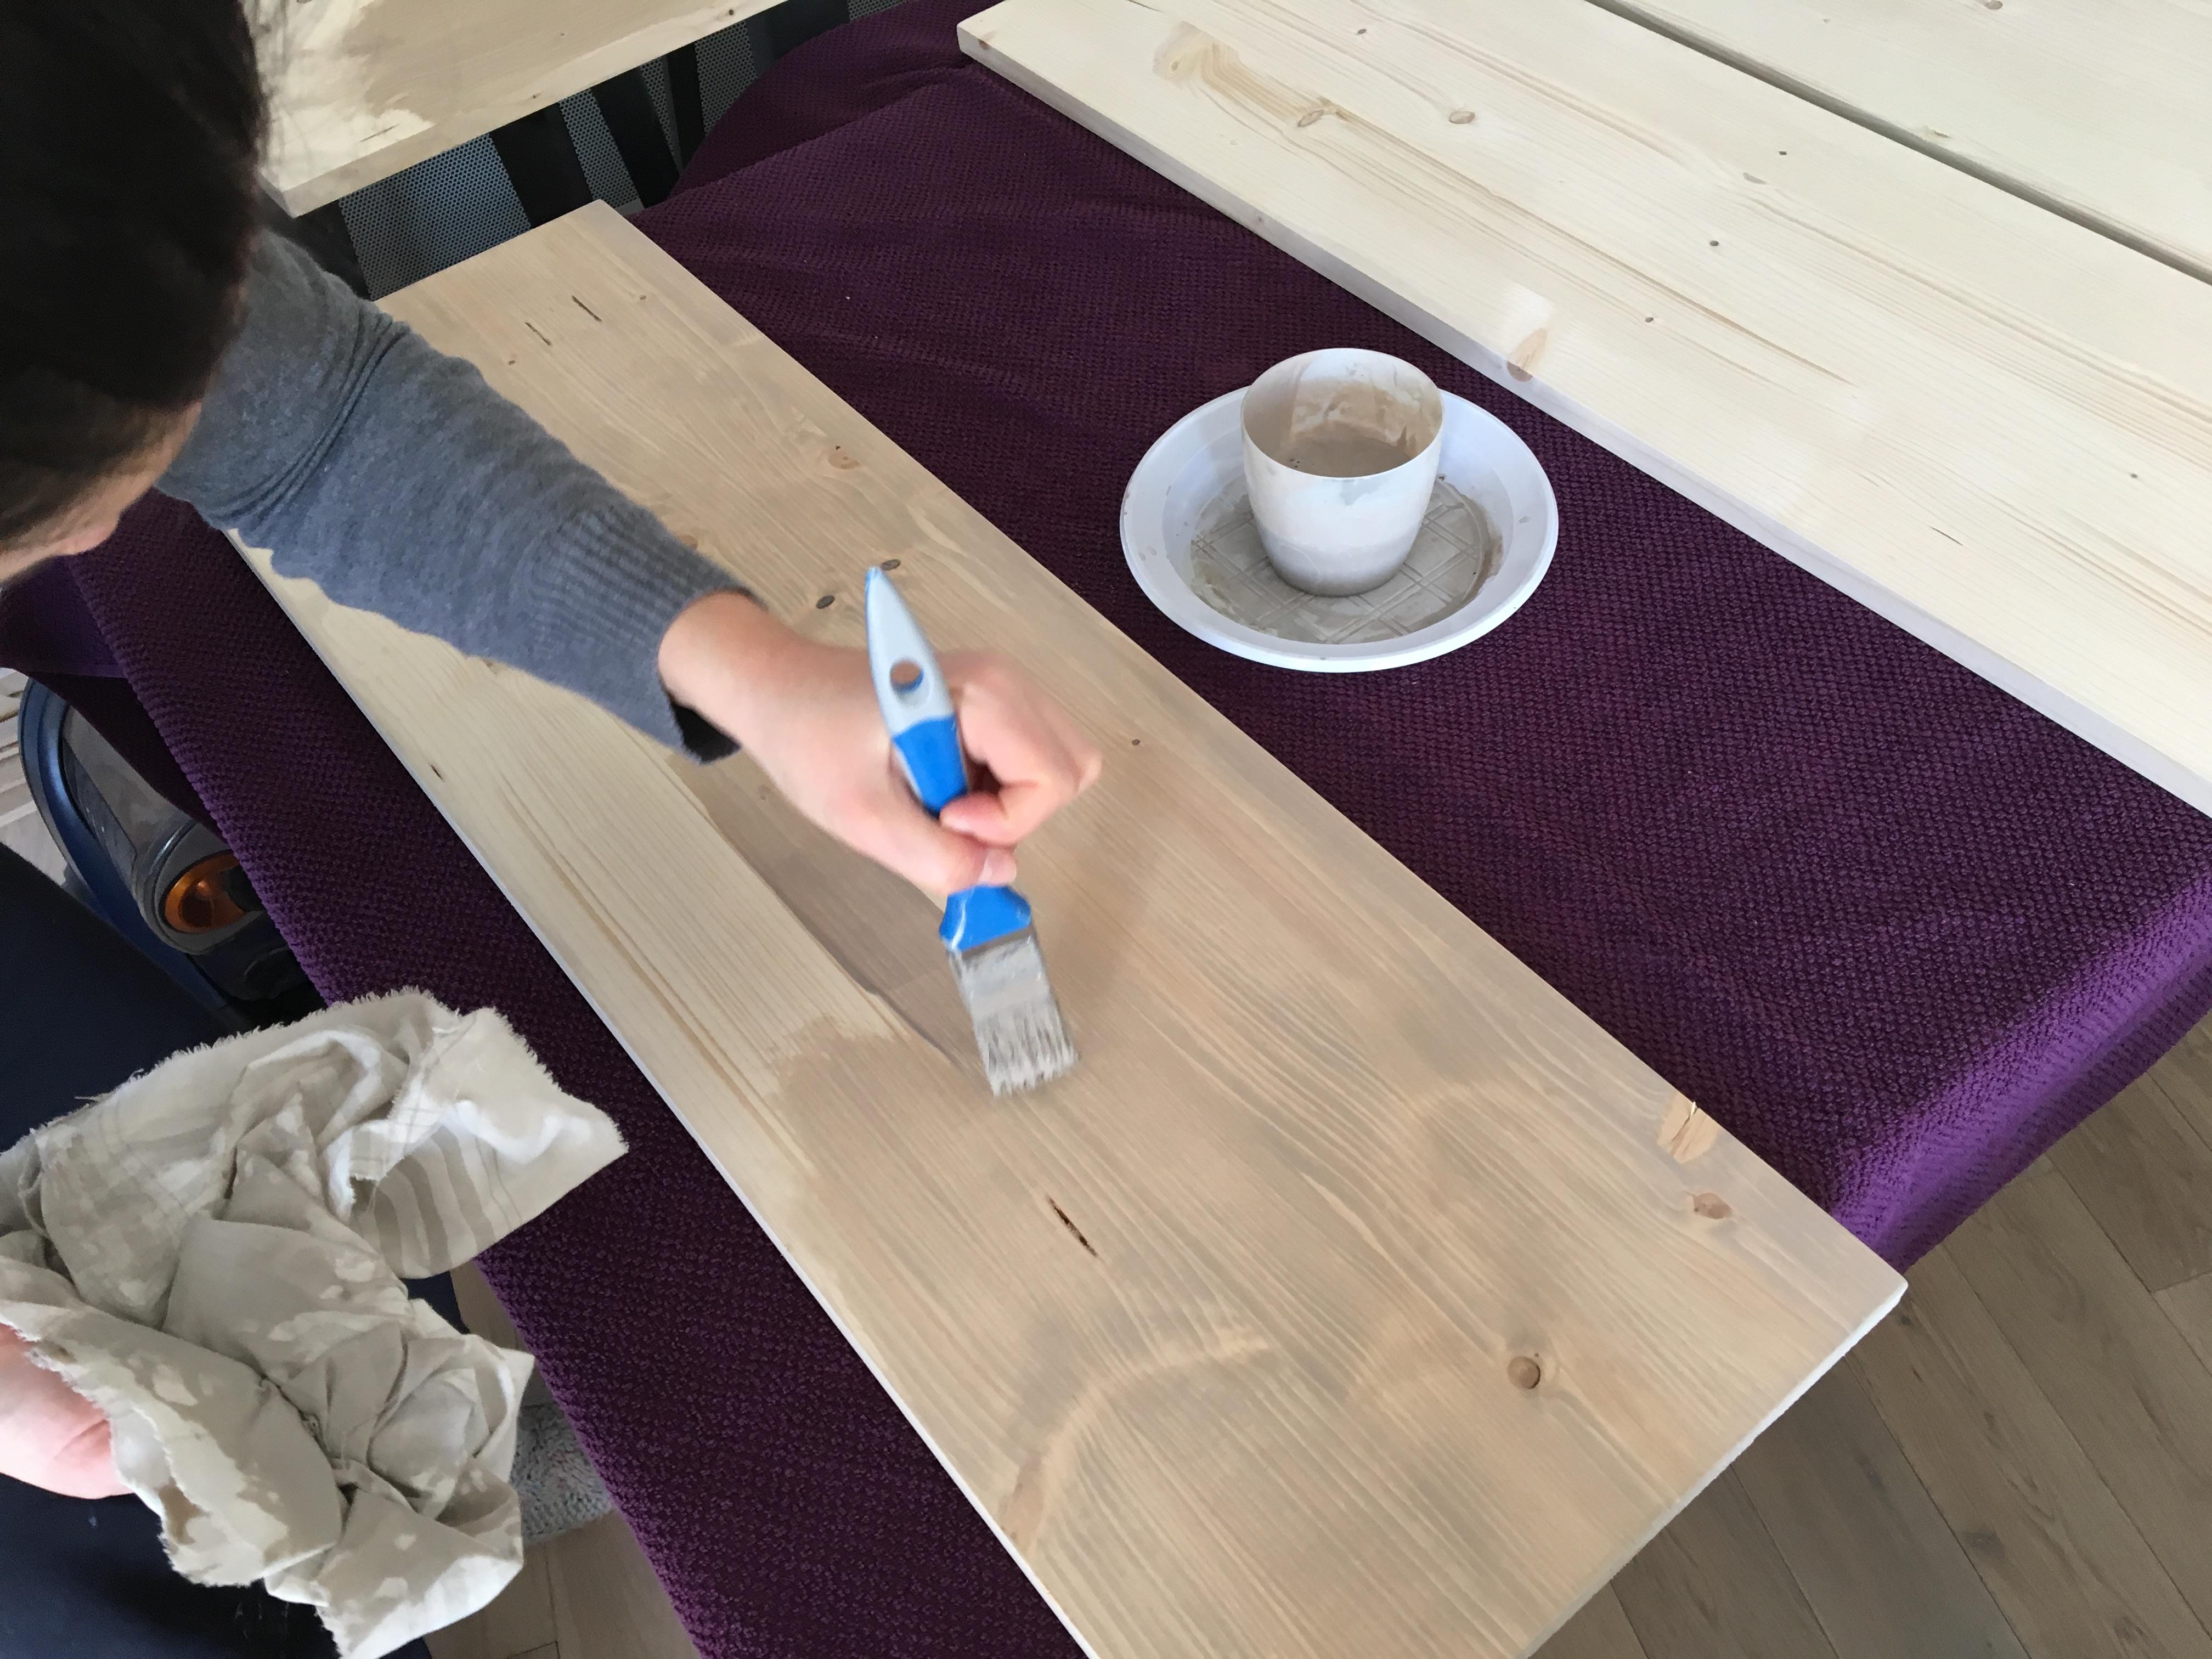 teinter du bois perfect teinter et vitrifier le bois with teinter du bois teinte de bois. Black Bedroom Furniture Sets. Home Design Ideas